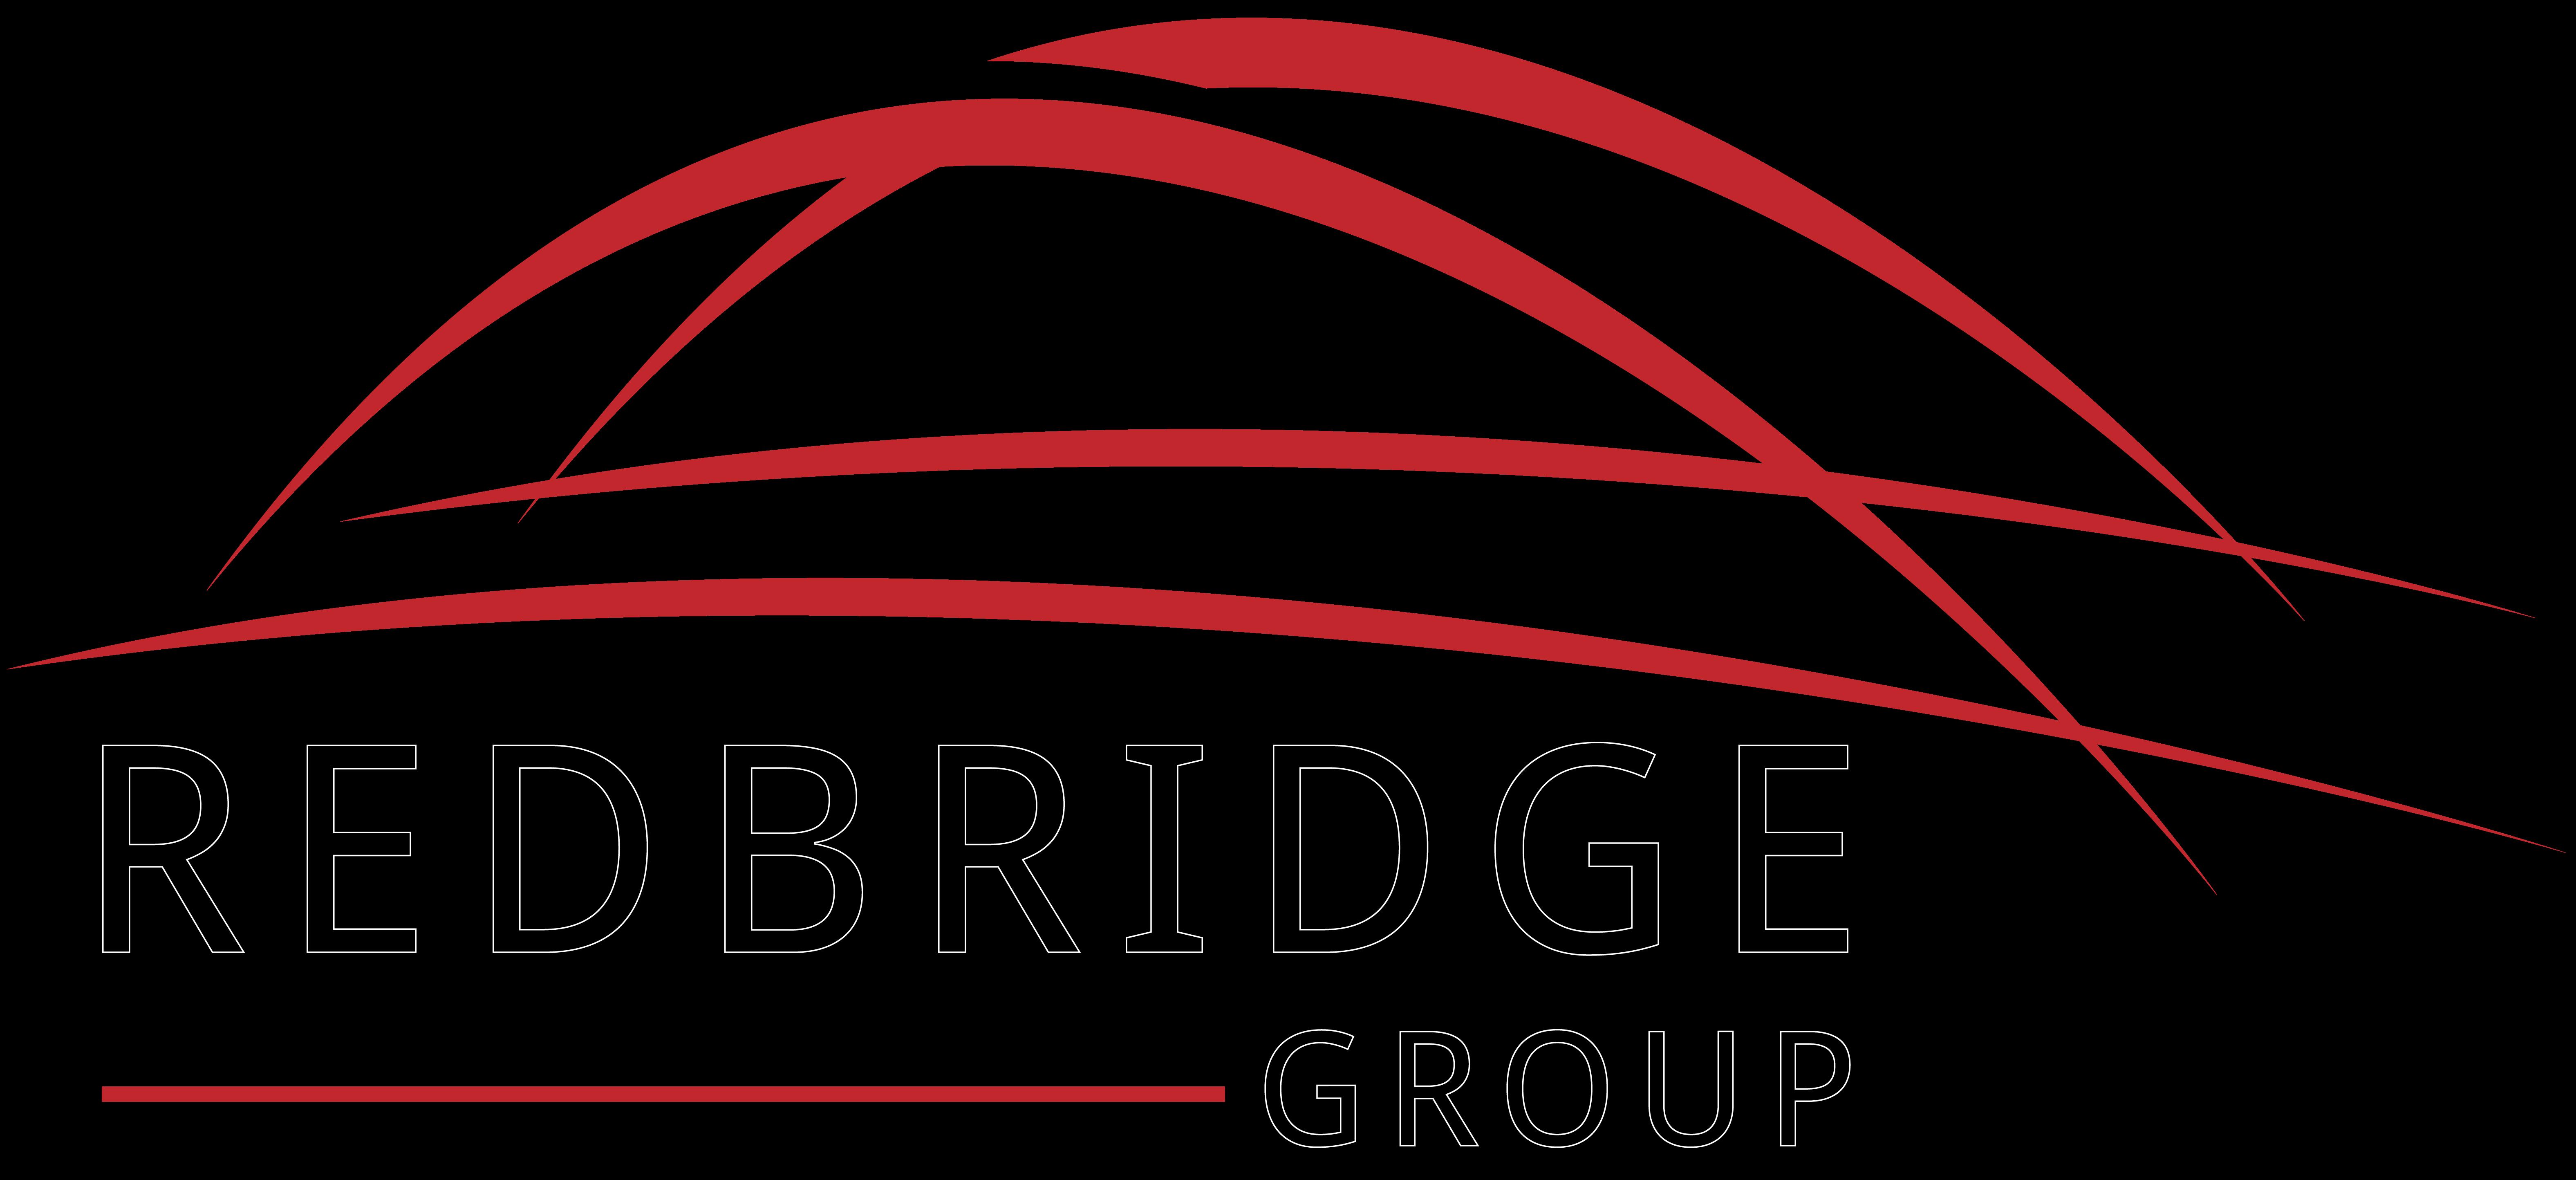 Redbridge group